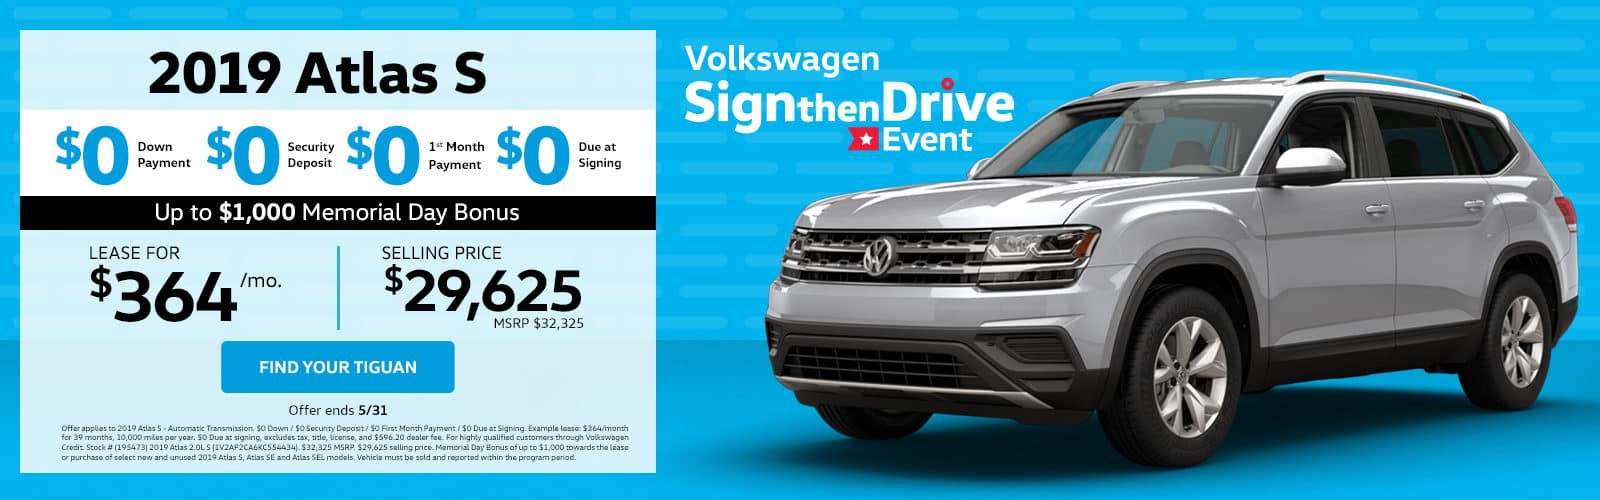 2019 VW Atlas